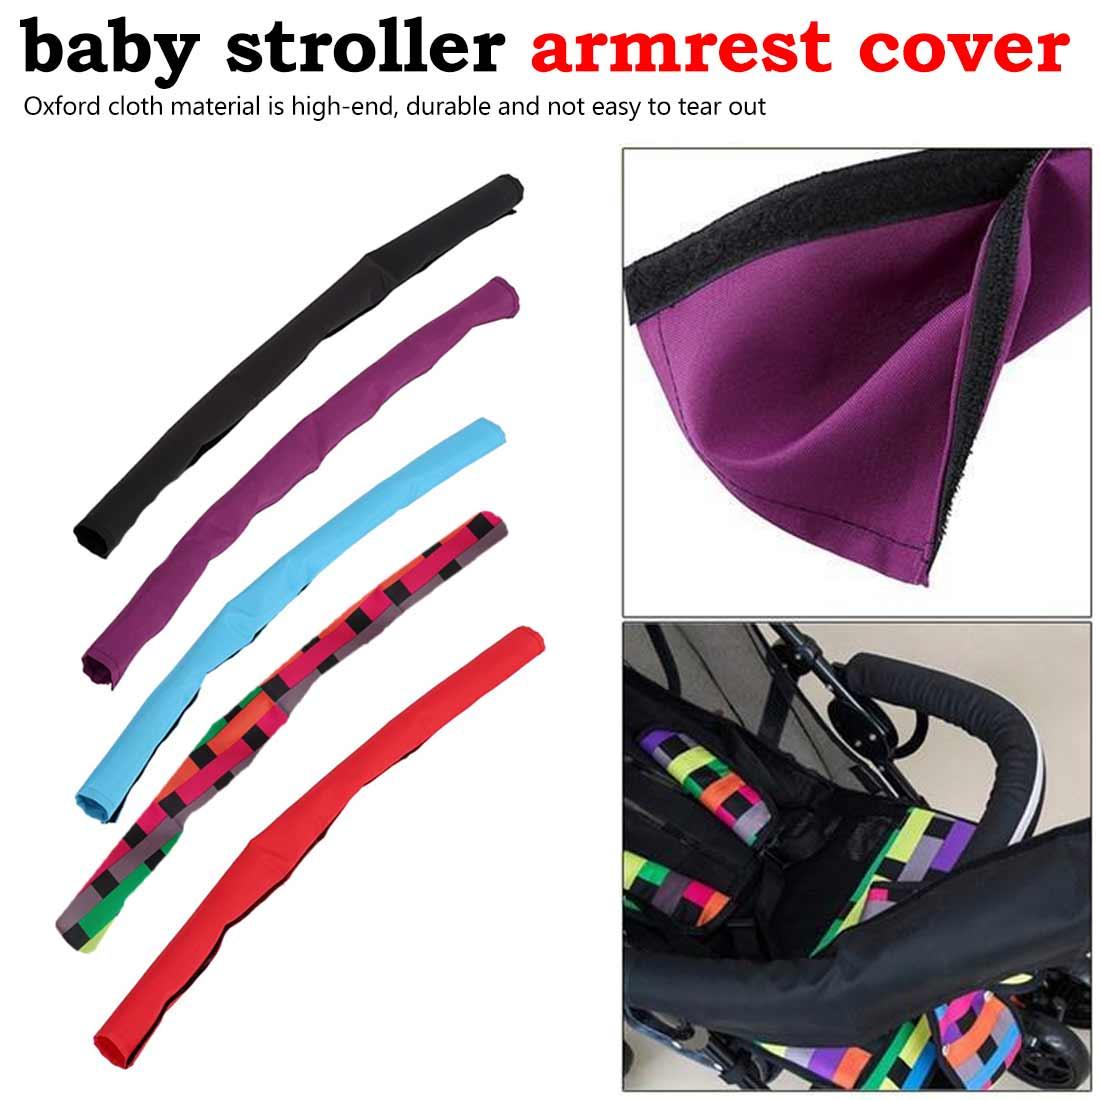 1Pcs Soft Pram General Armrest Cover Bumper Bar Cover Infantil Carriages Cloth Case Washable Baby Stroller Accessories